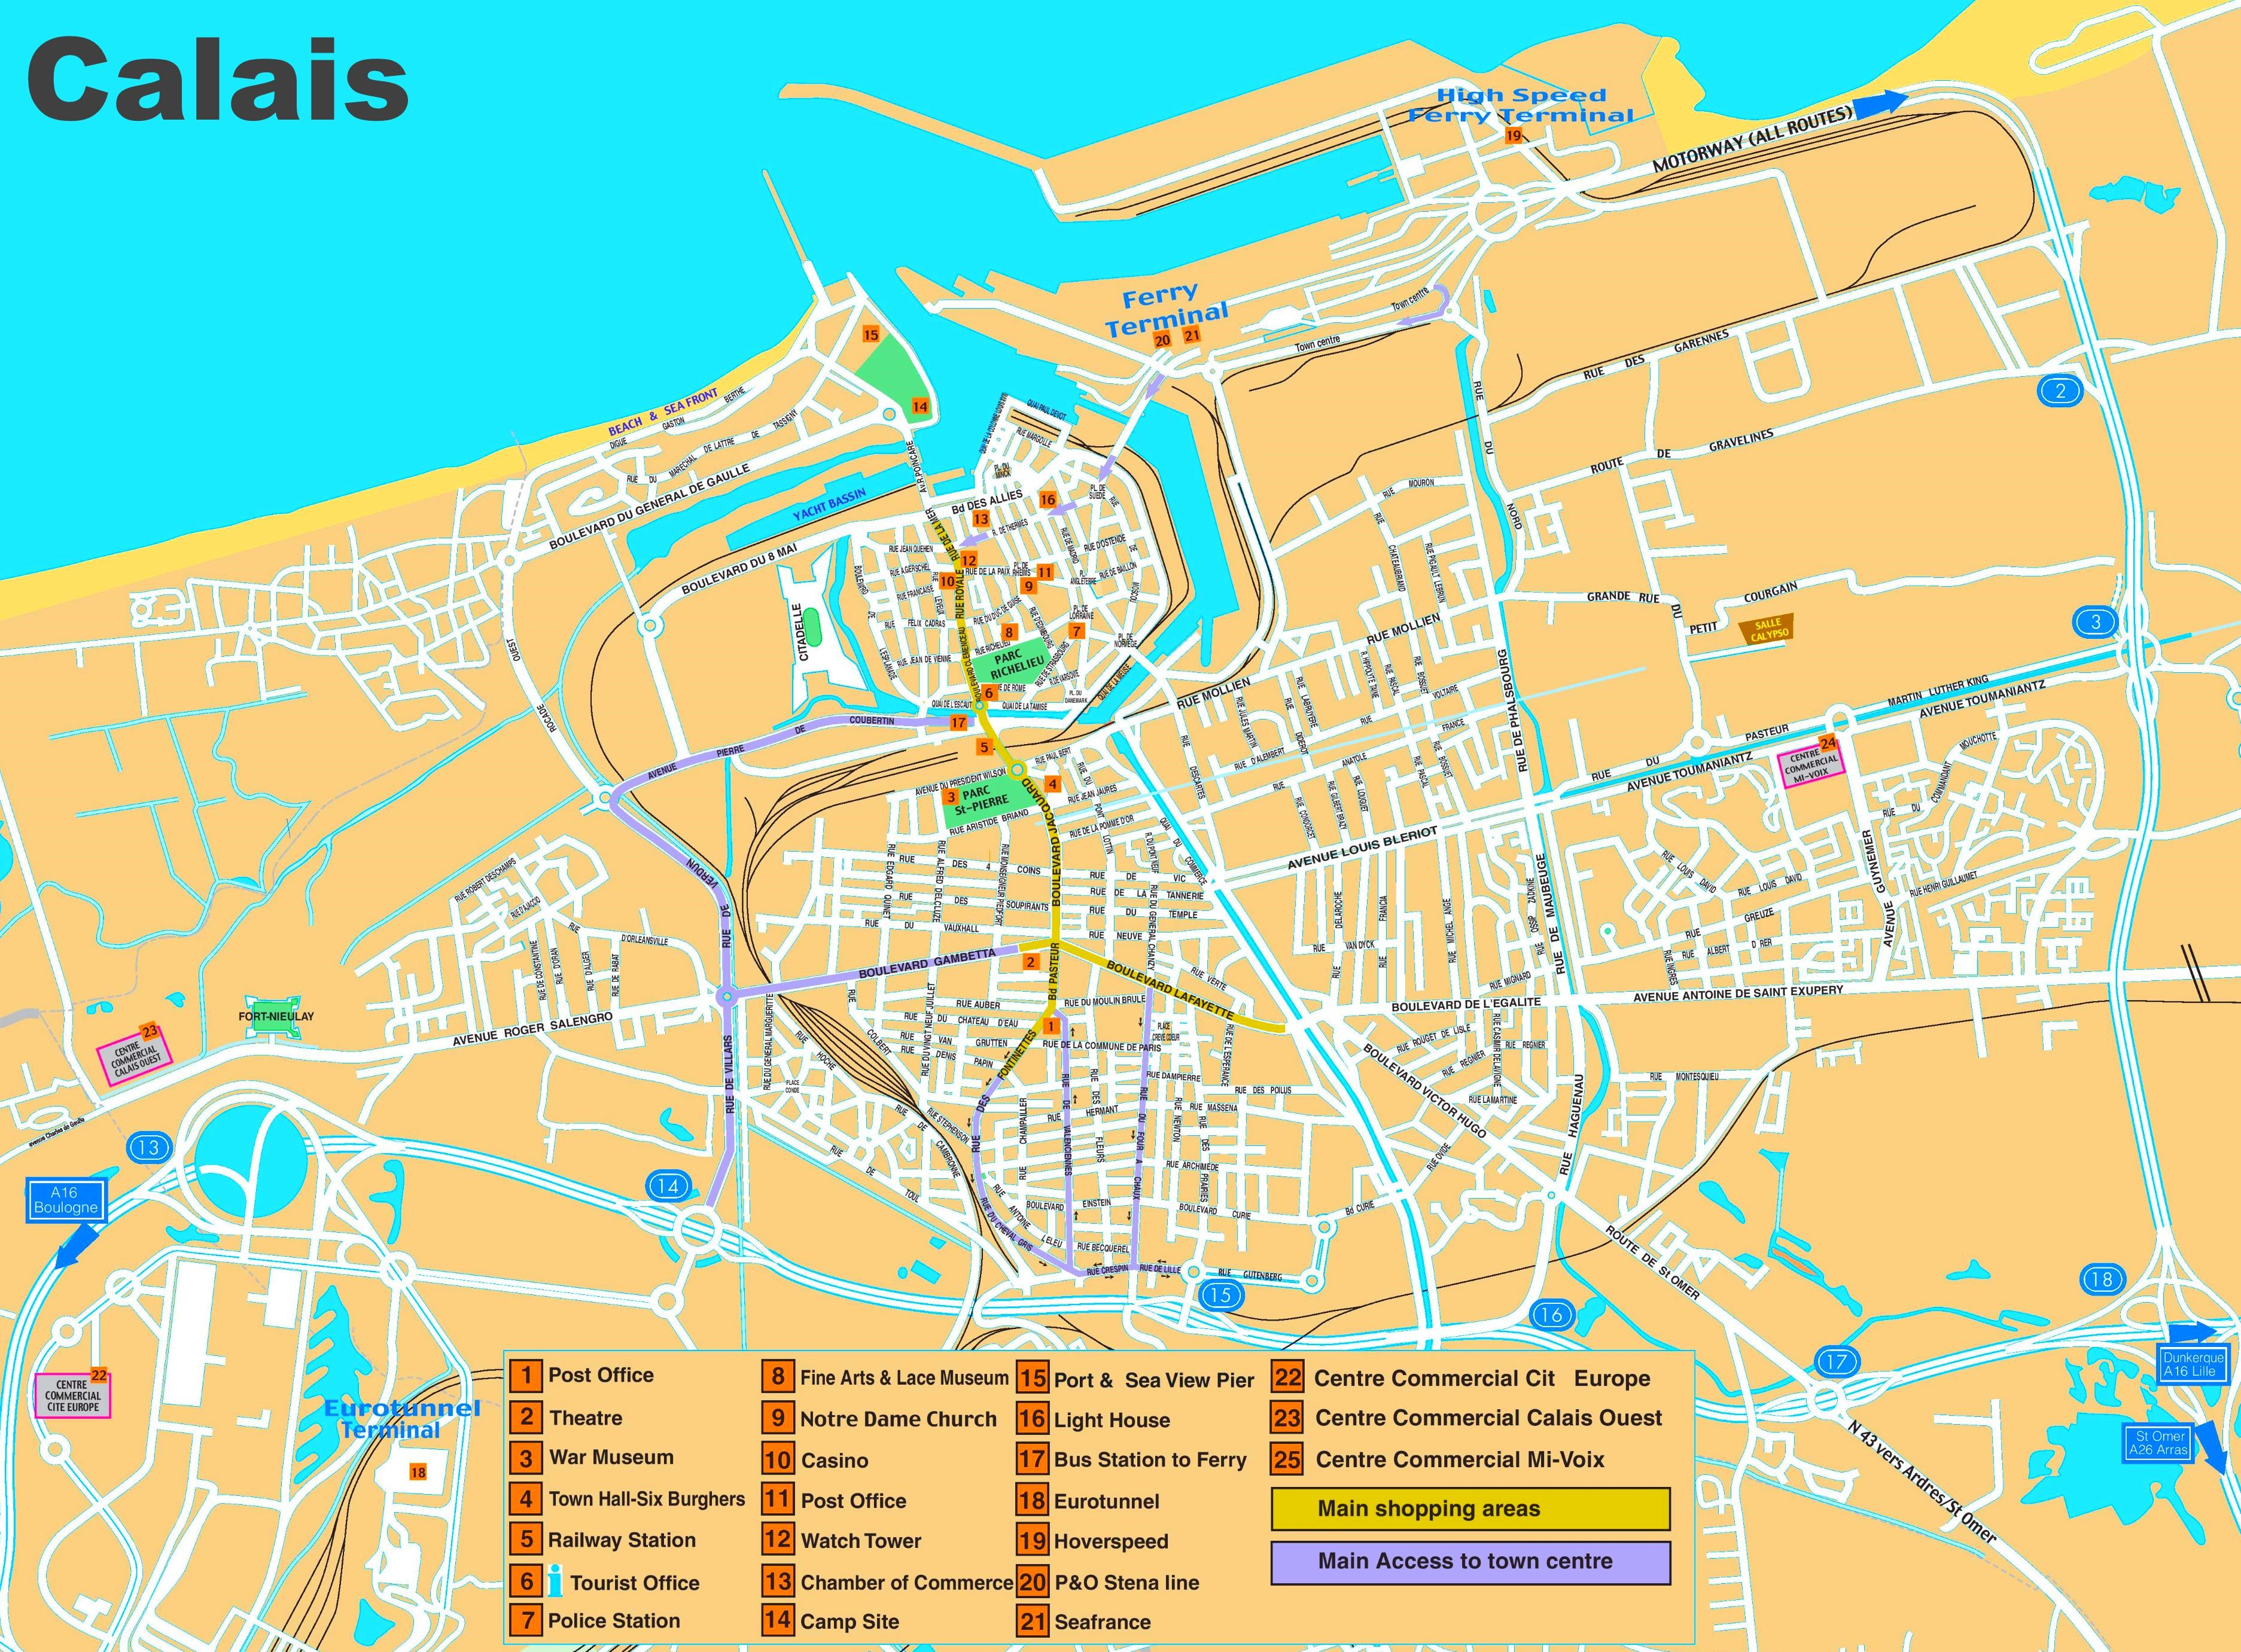 Map Of Calais Calais sightseeing map Map Of Calais